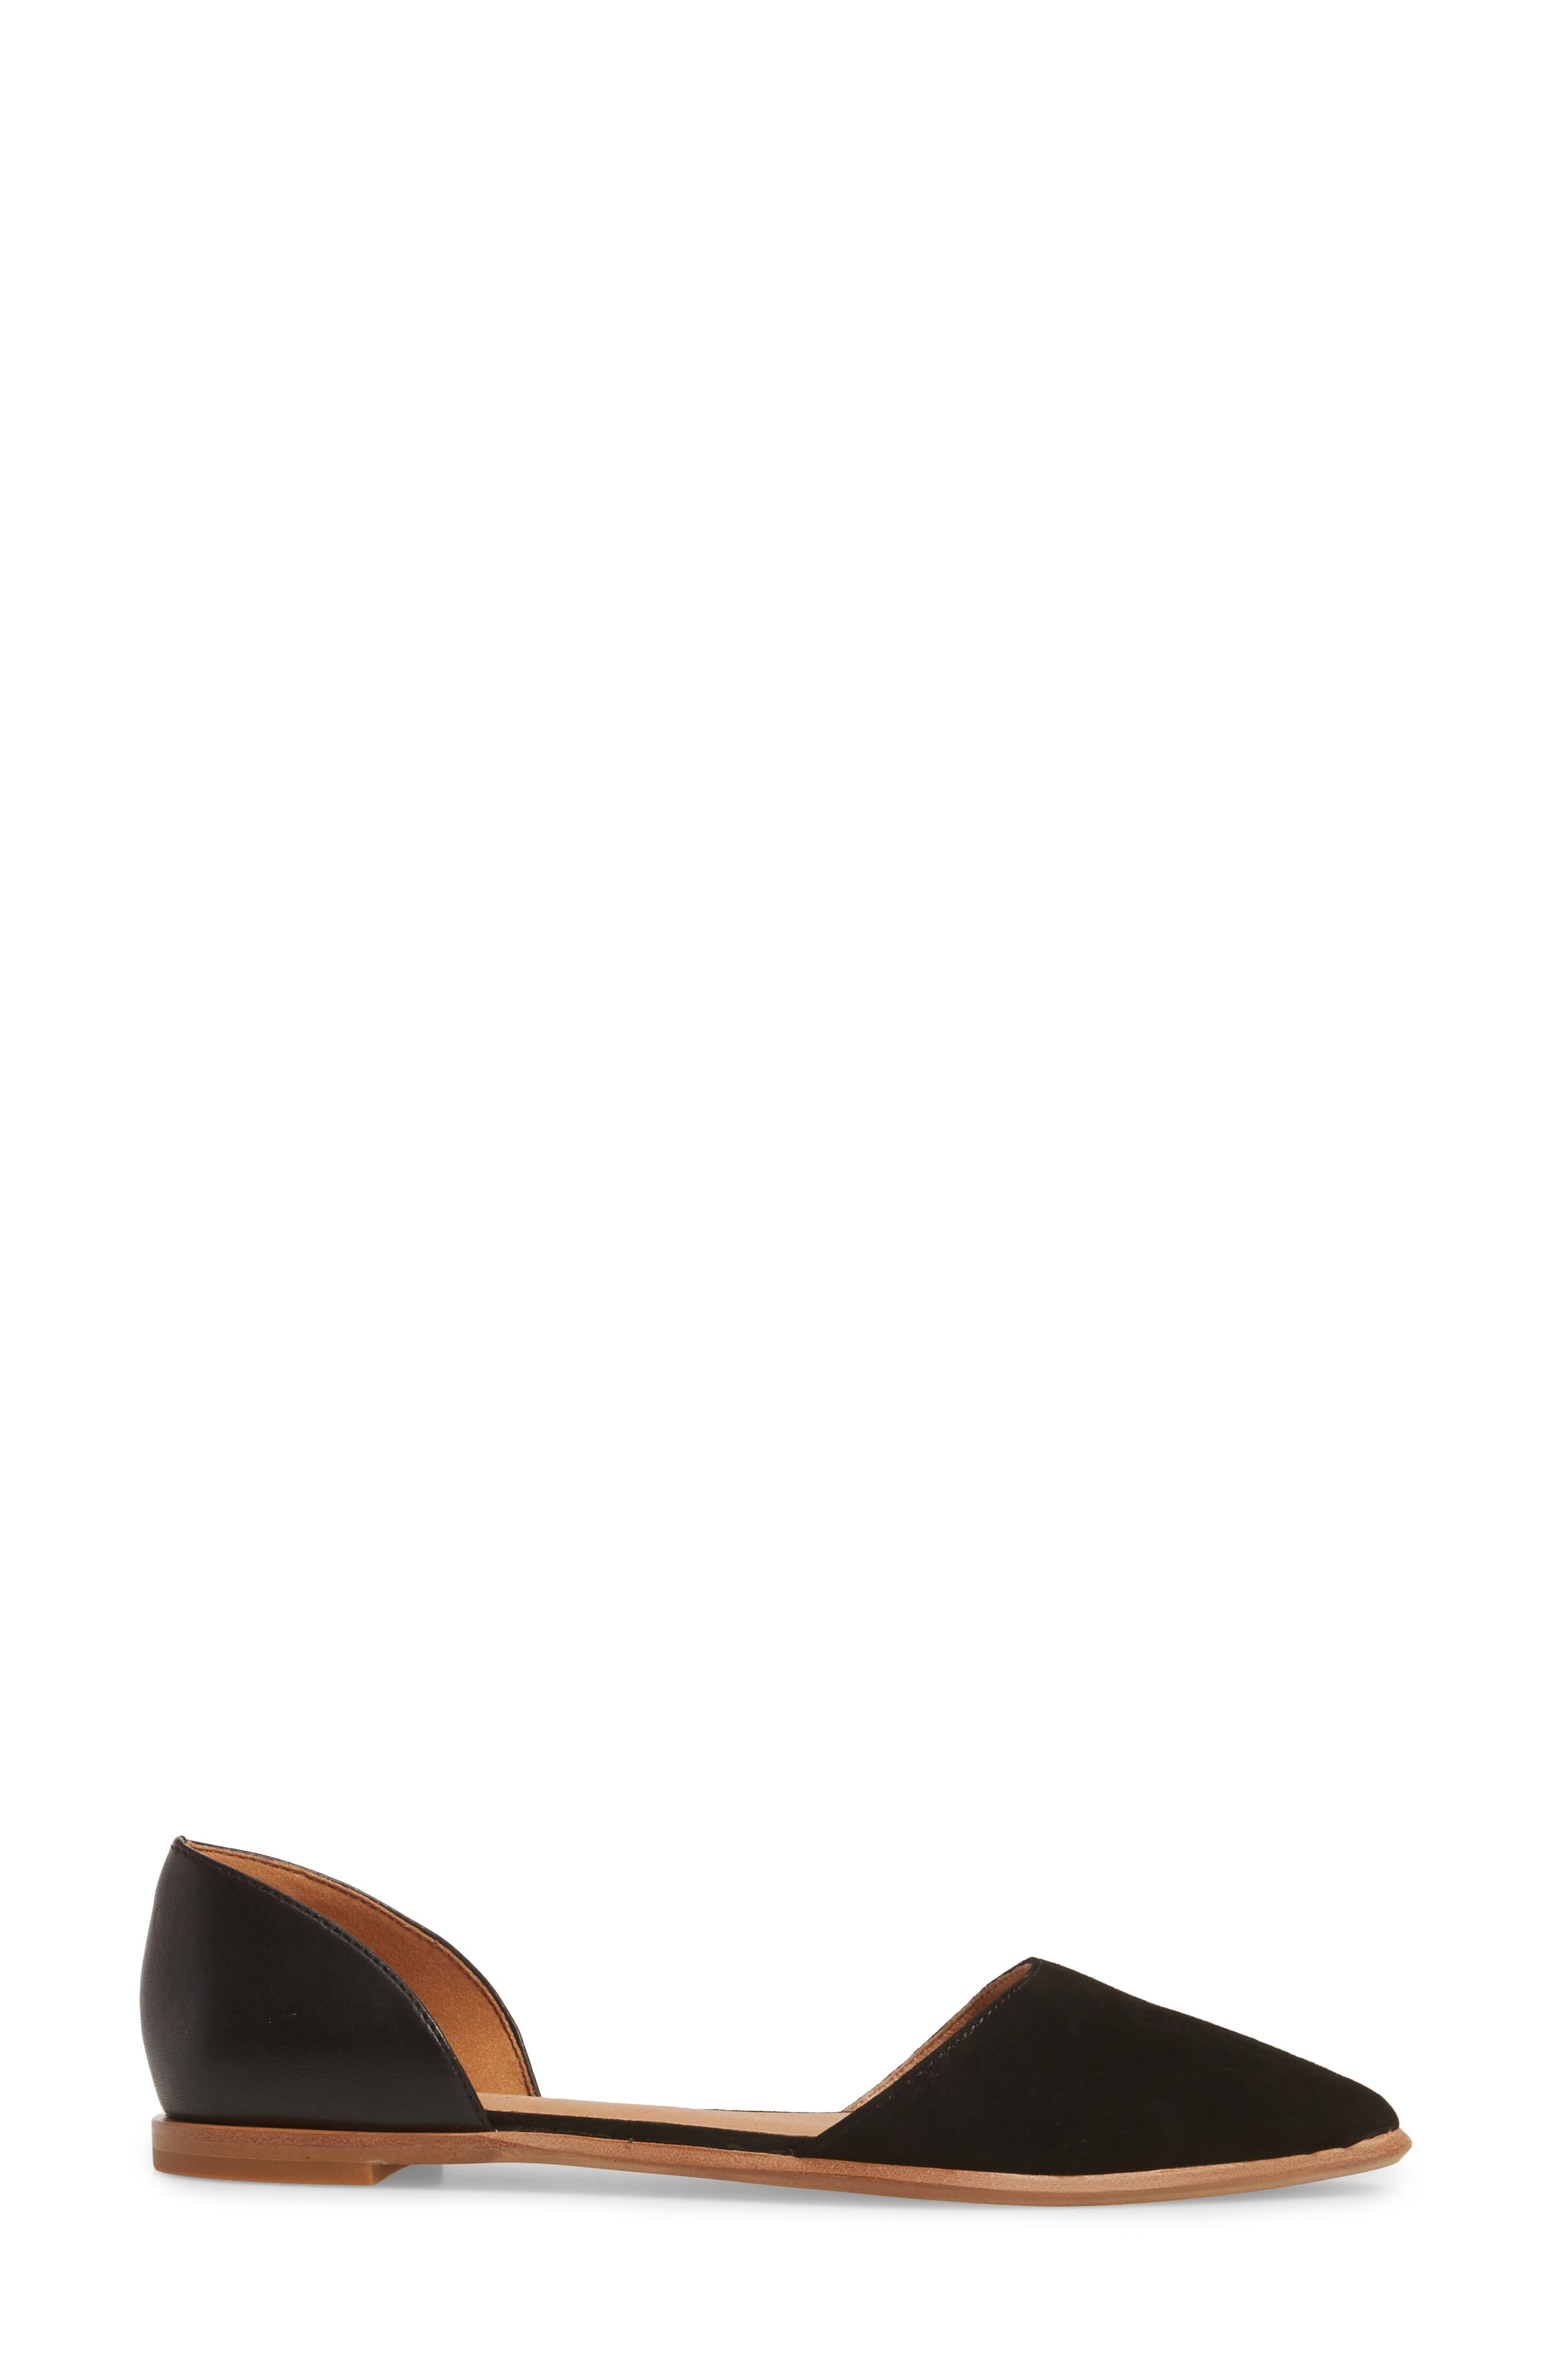 Arielle d'Orsay Flat,                             Alternate thumbnail 3, color,                             001